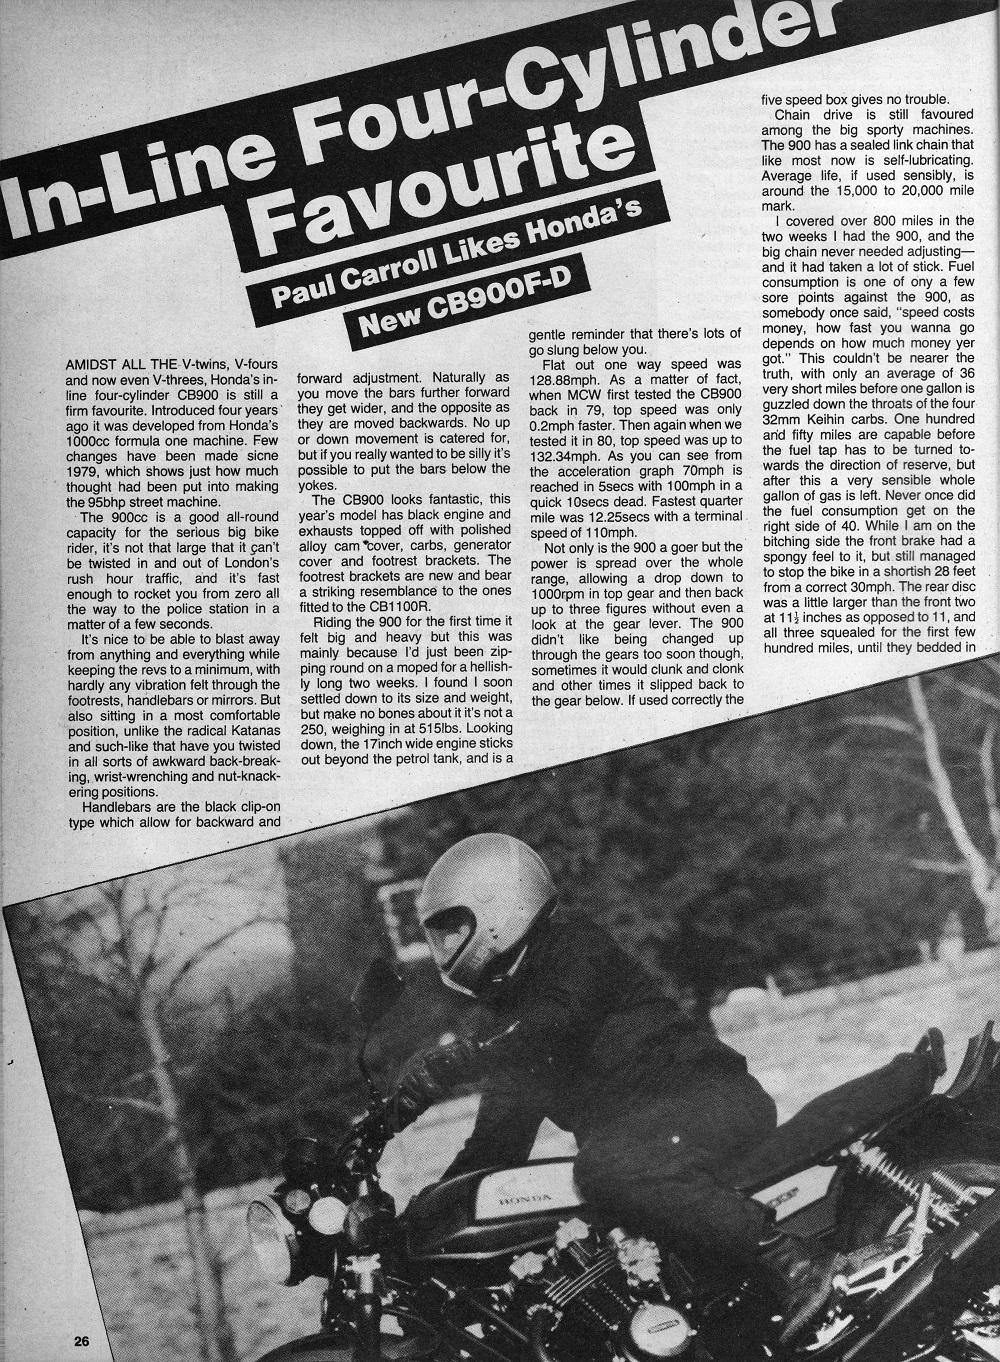 1983 Honda CB900F-D road test.1.jpg